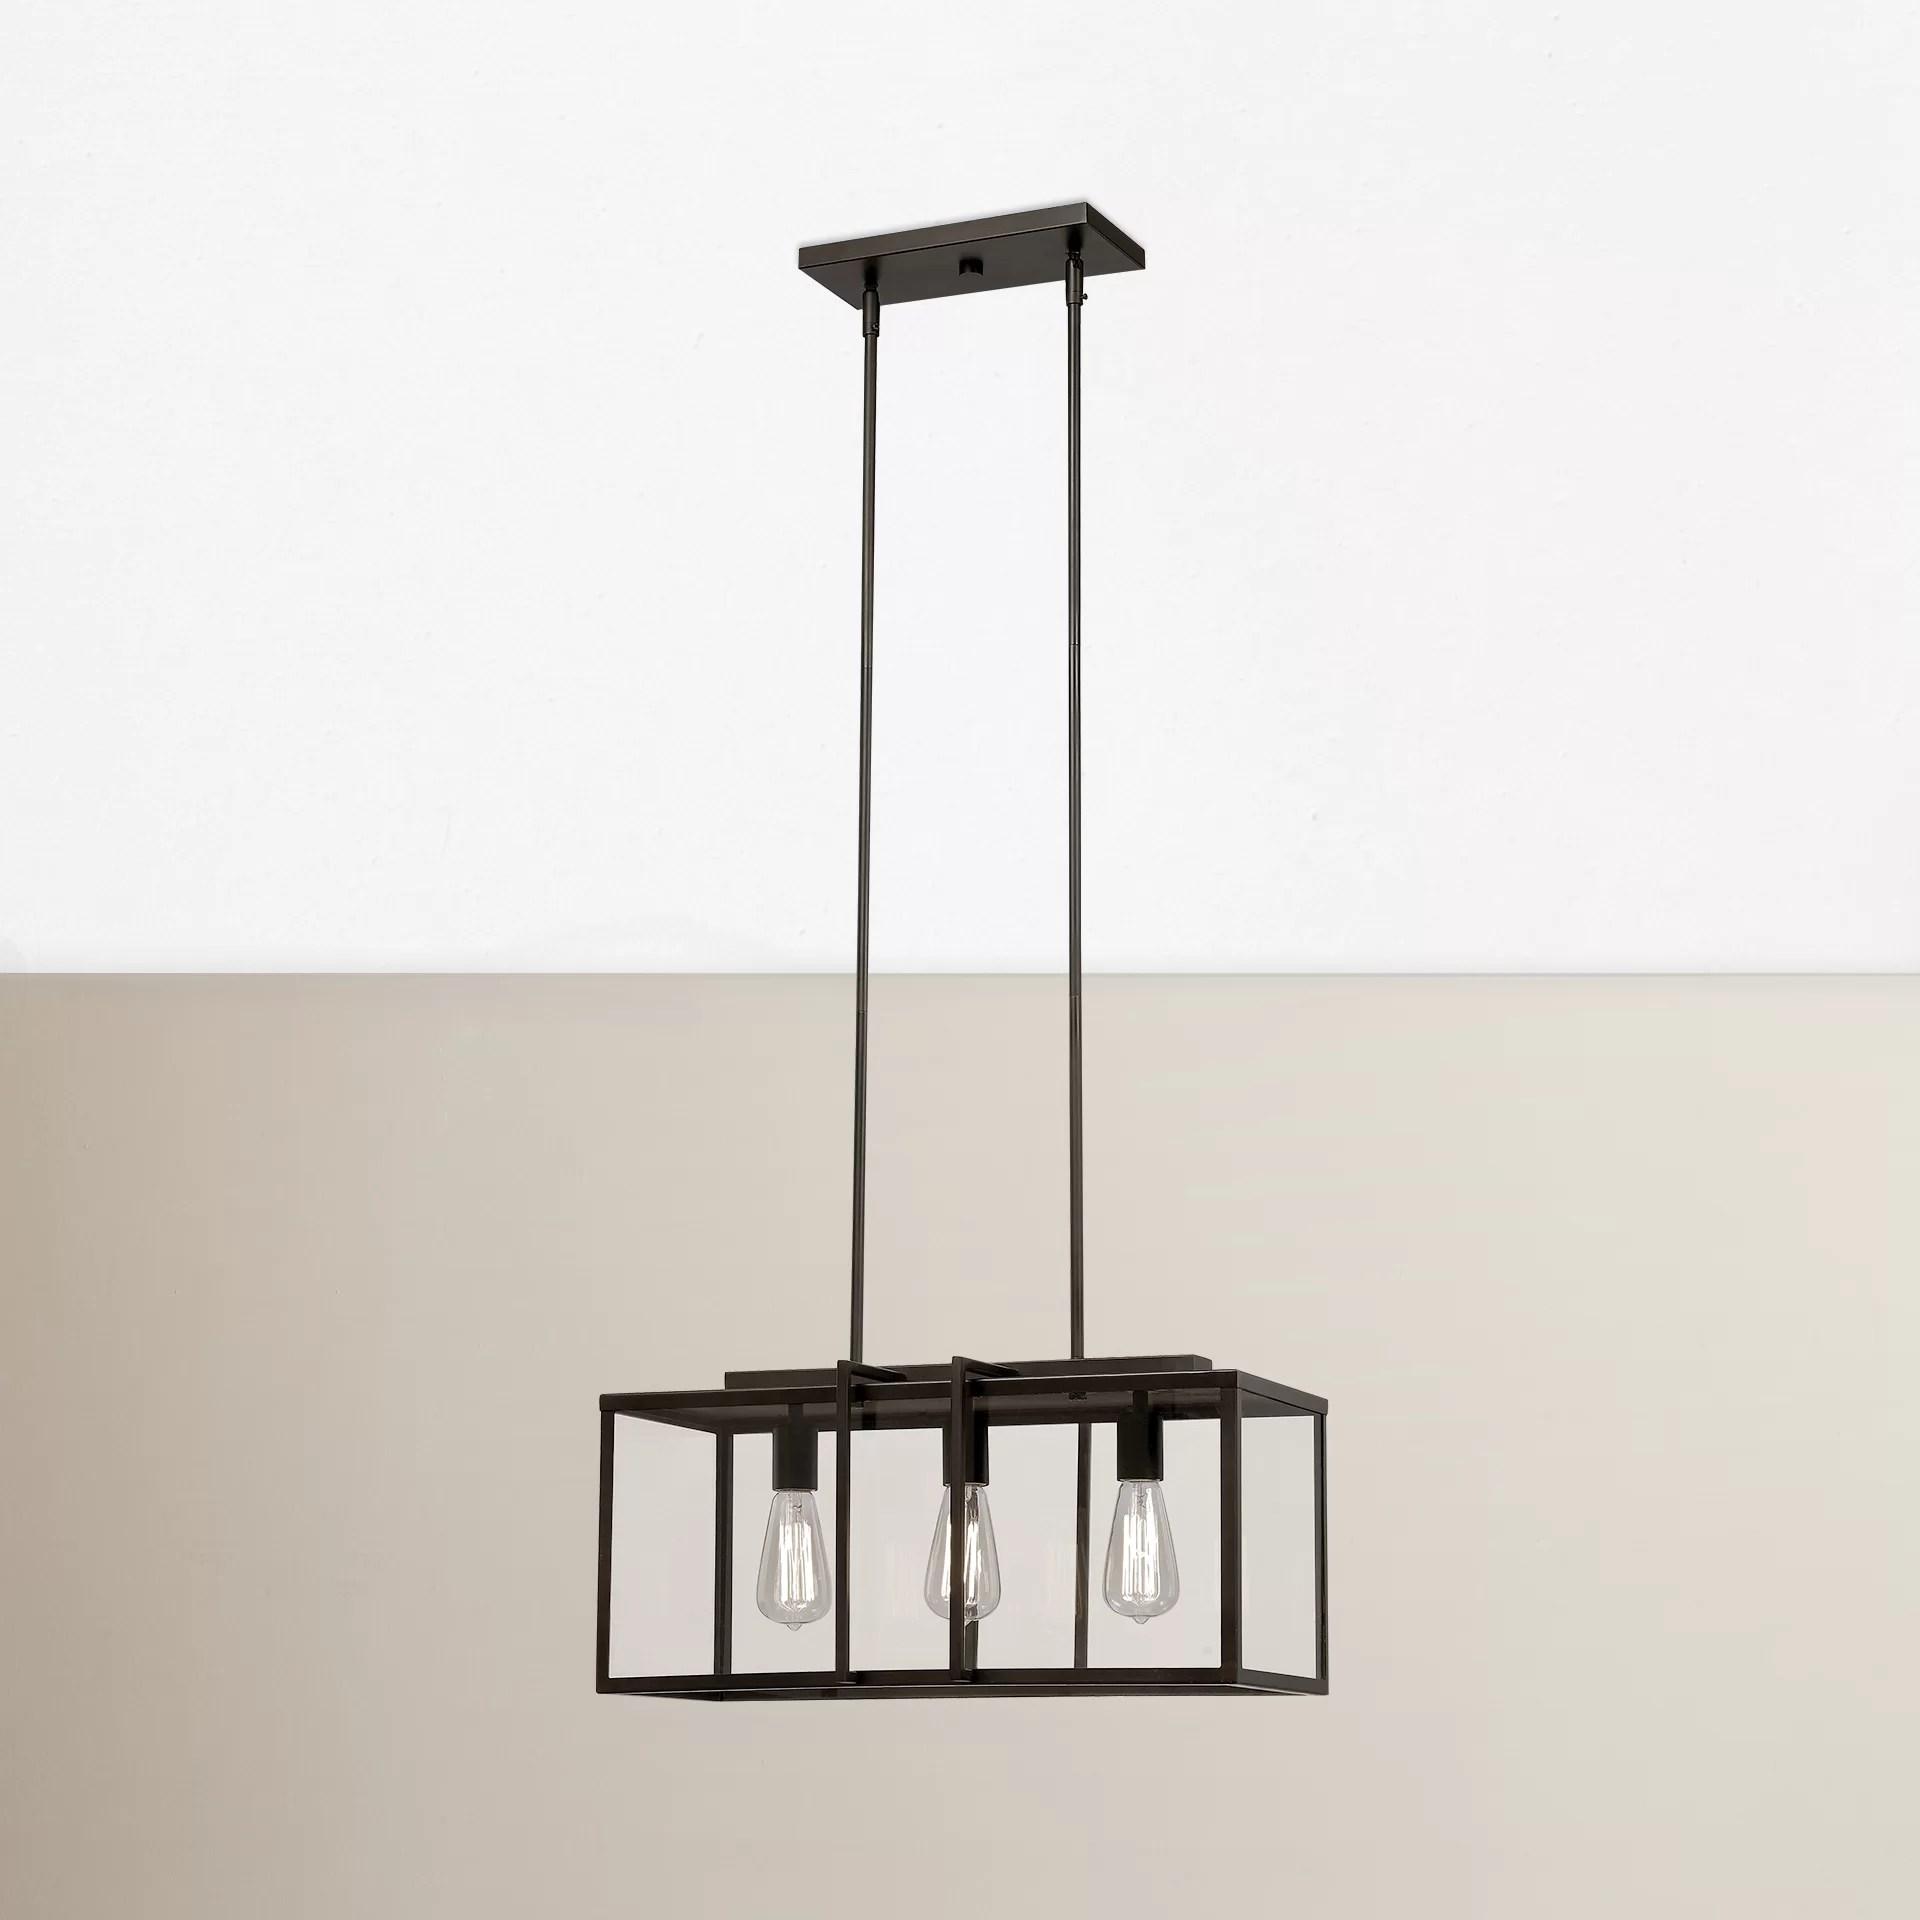 3 light kitchen island pendant dutch boy and bath paint trent austin design